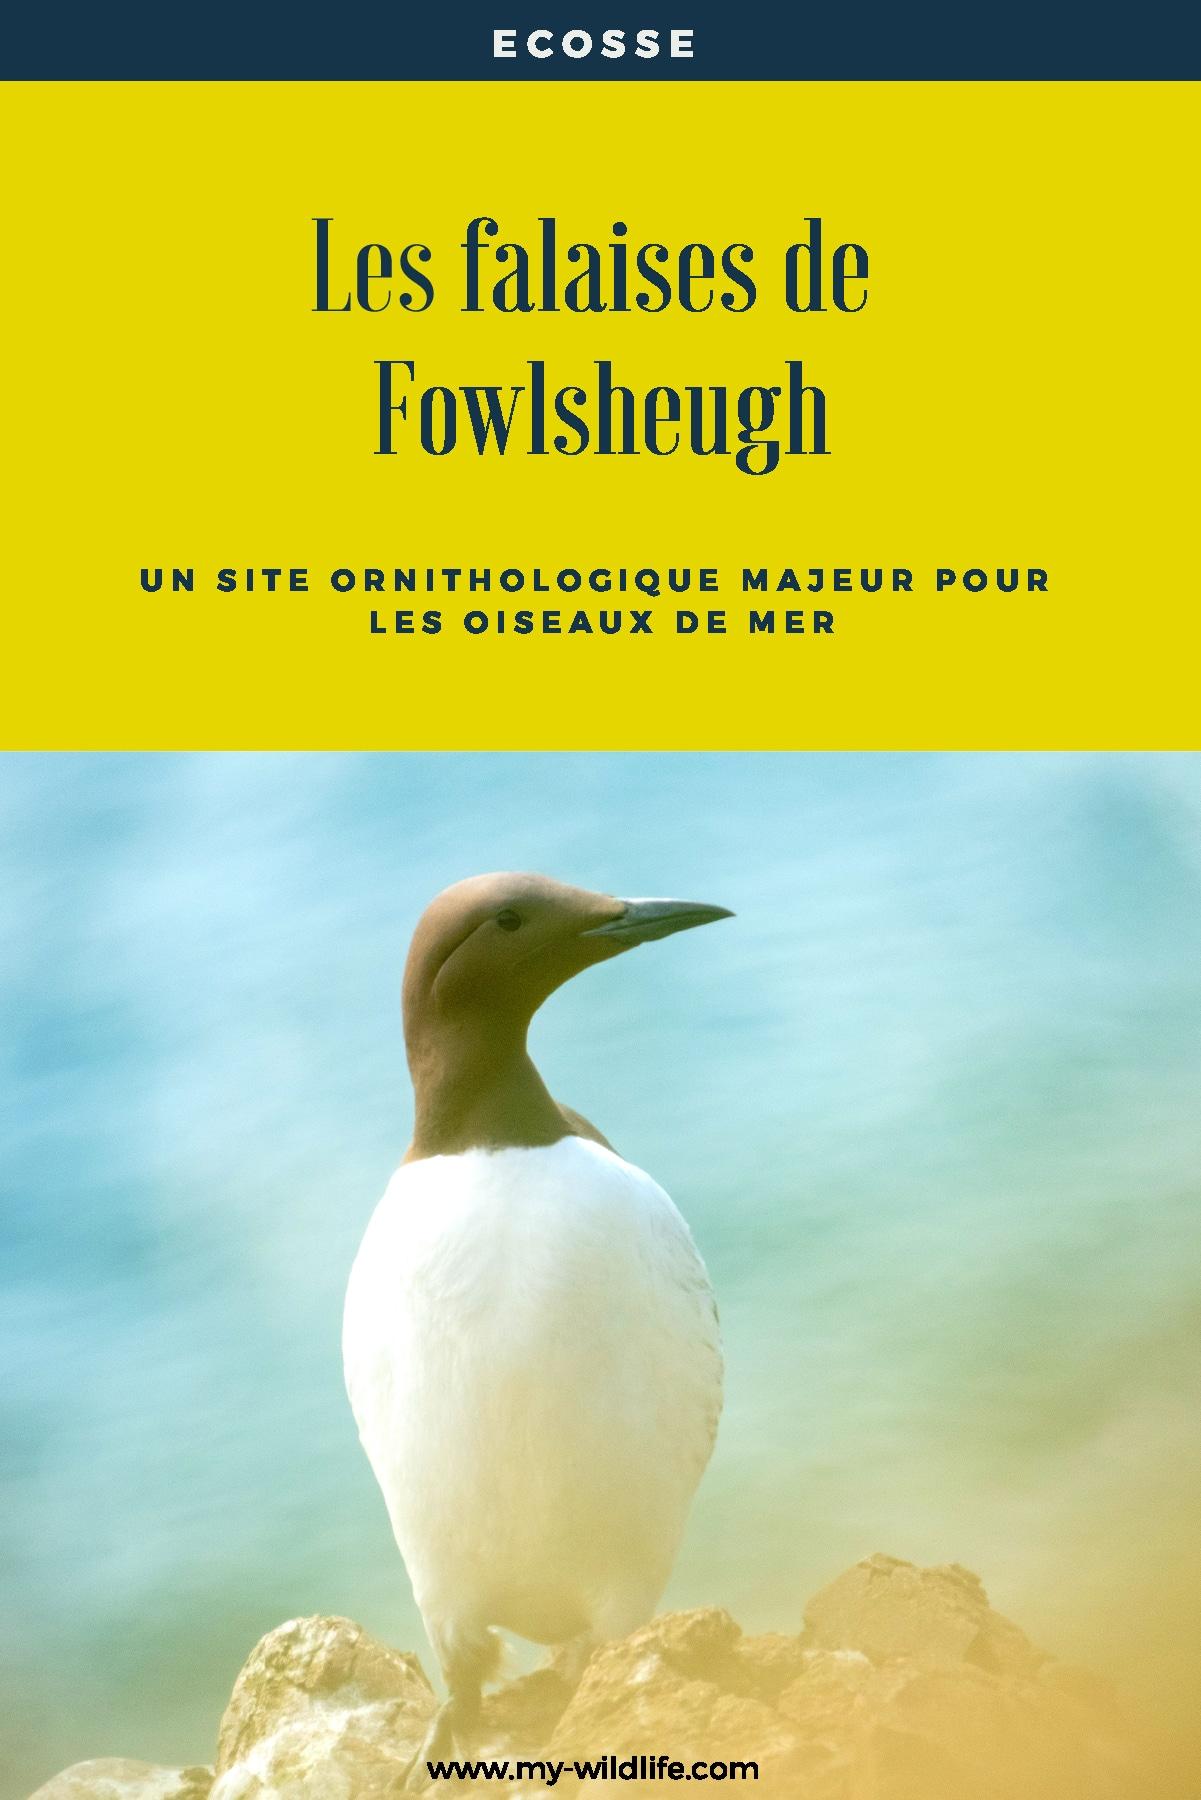 Fowlsheugh-02